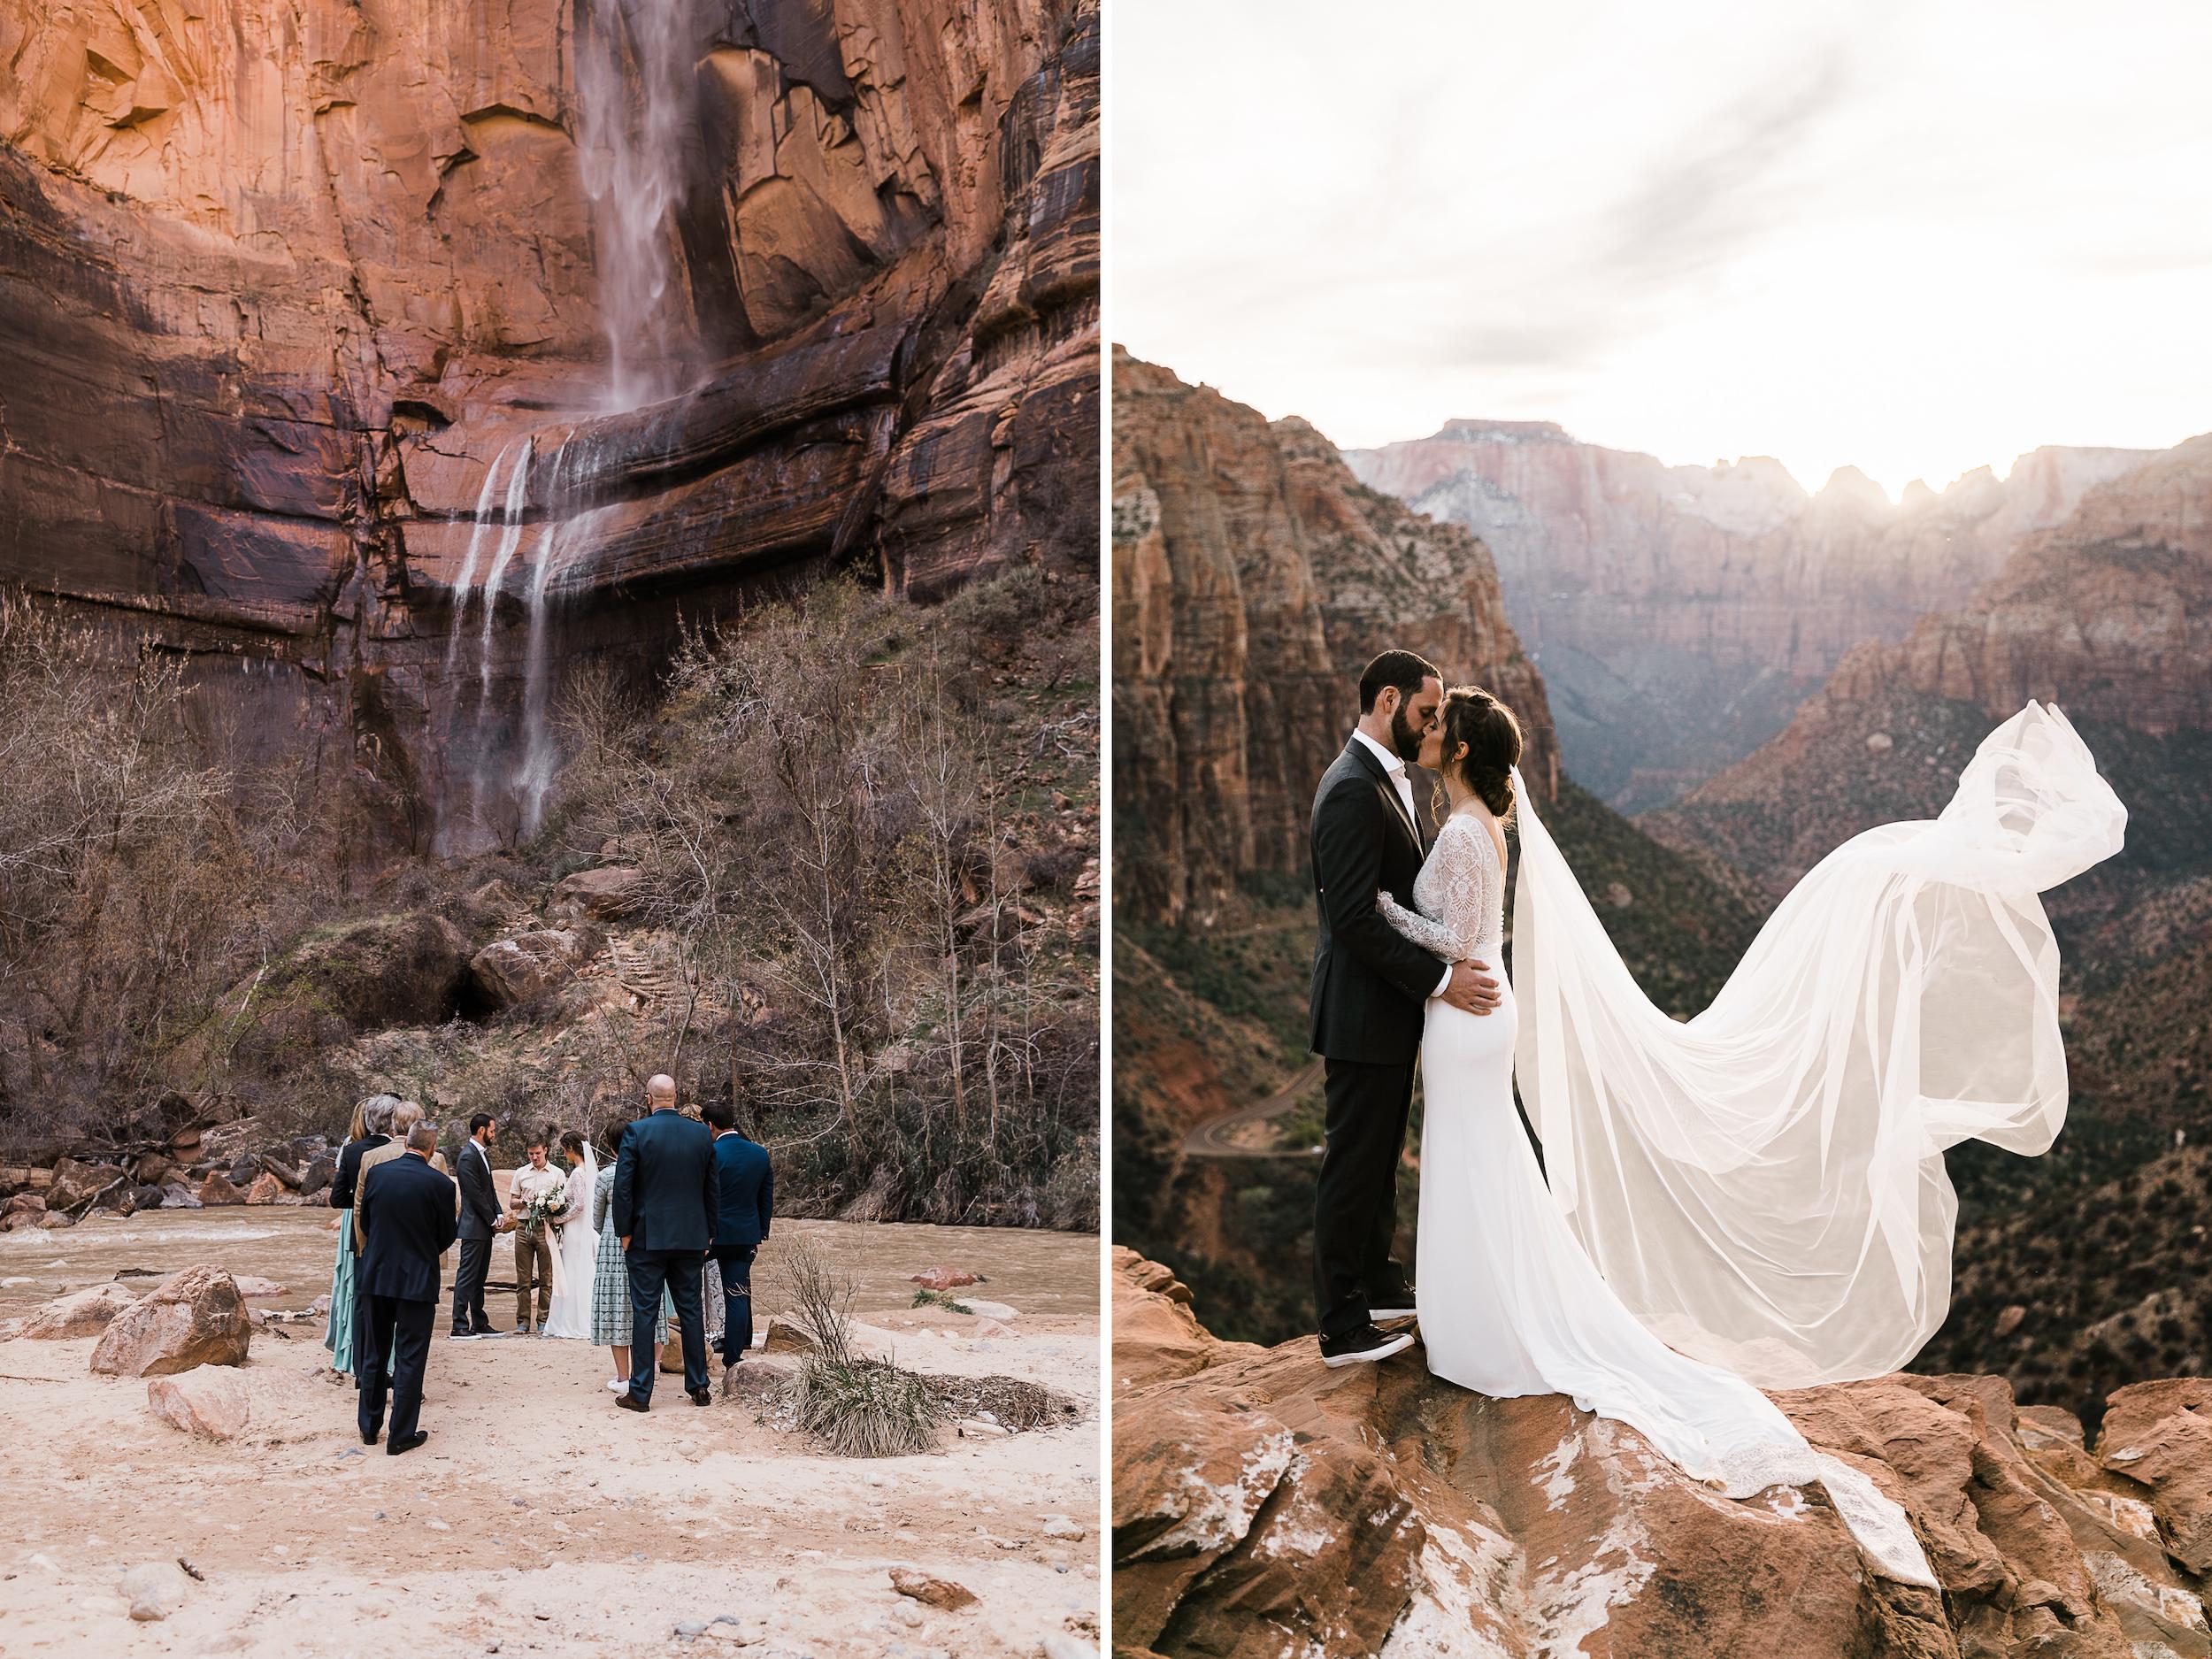 Zion-National-Park-Adventure-Wedding-Hearnes-Elopement-Photography-2.jpg